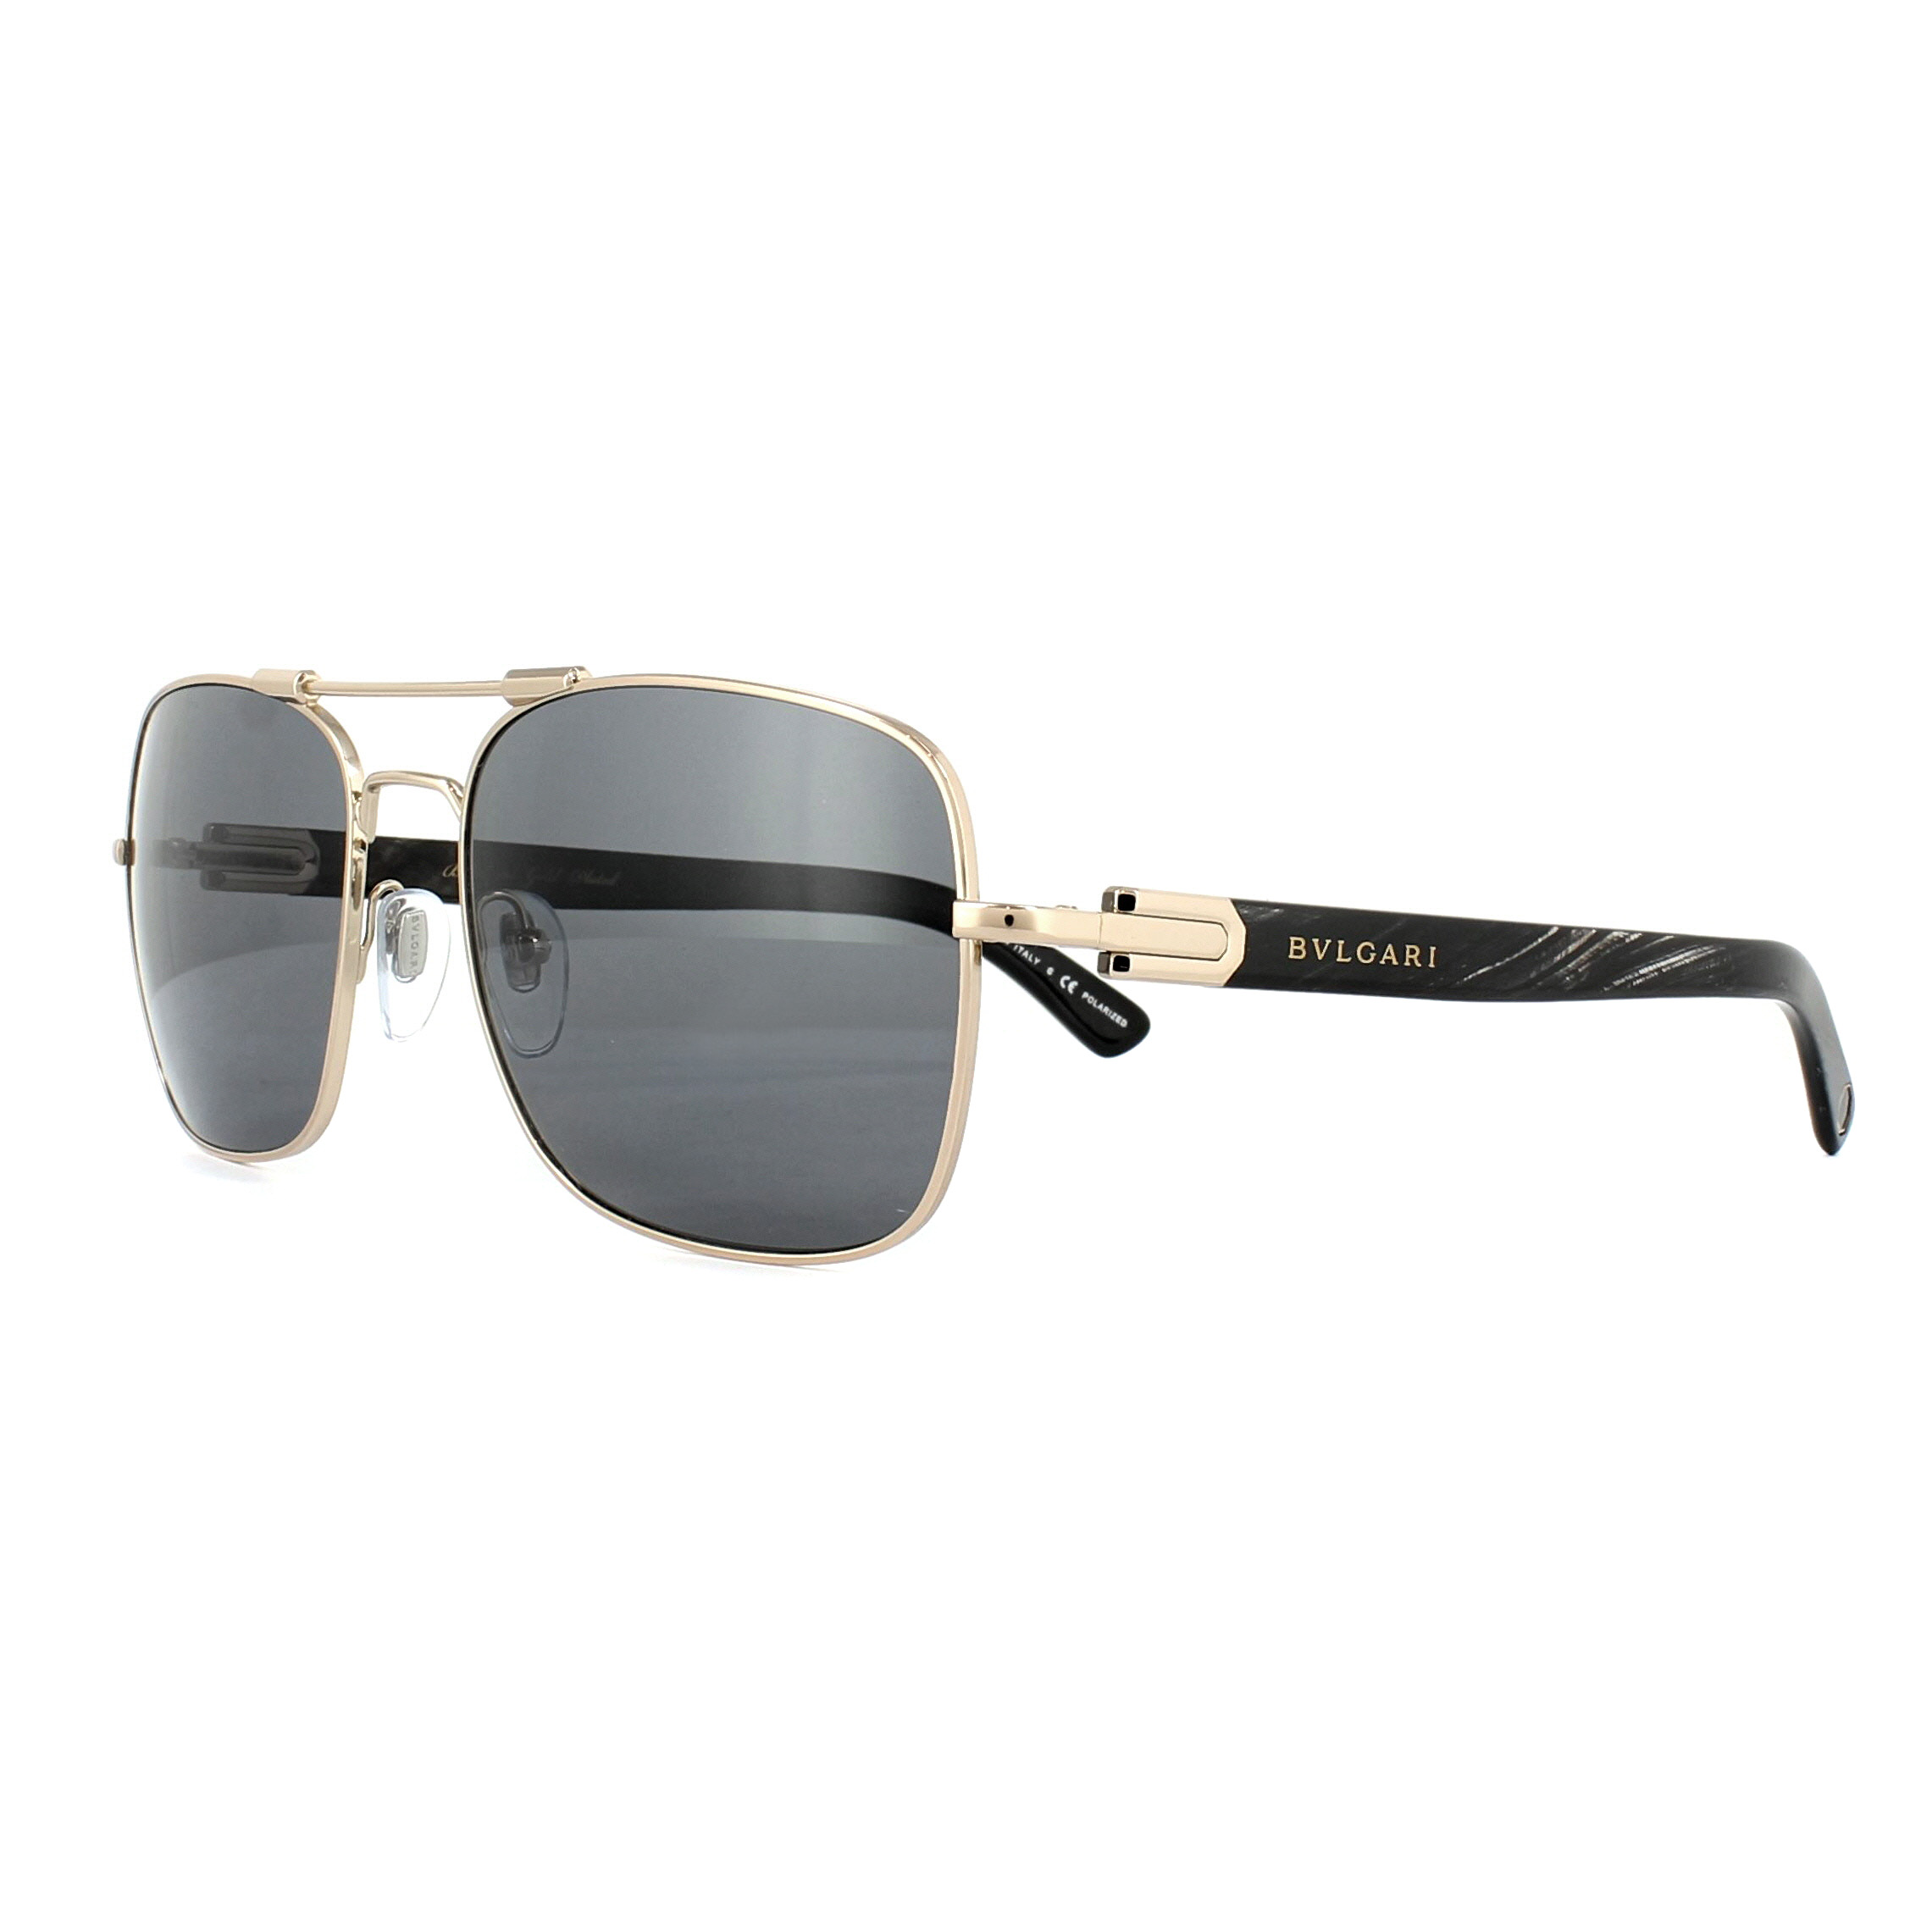 119046dde1 Sentinel Bvlgari Sunglasses 5039K 395/81 Rose Gold Plated Grey Polarized